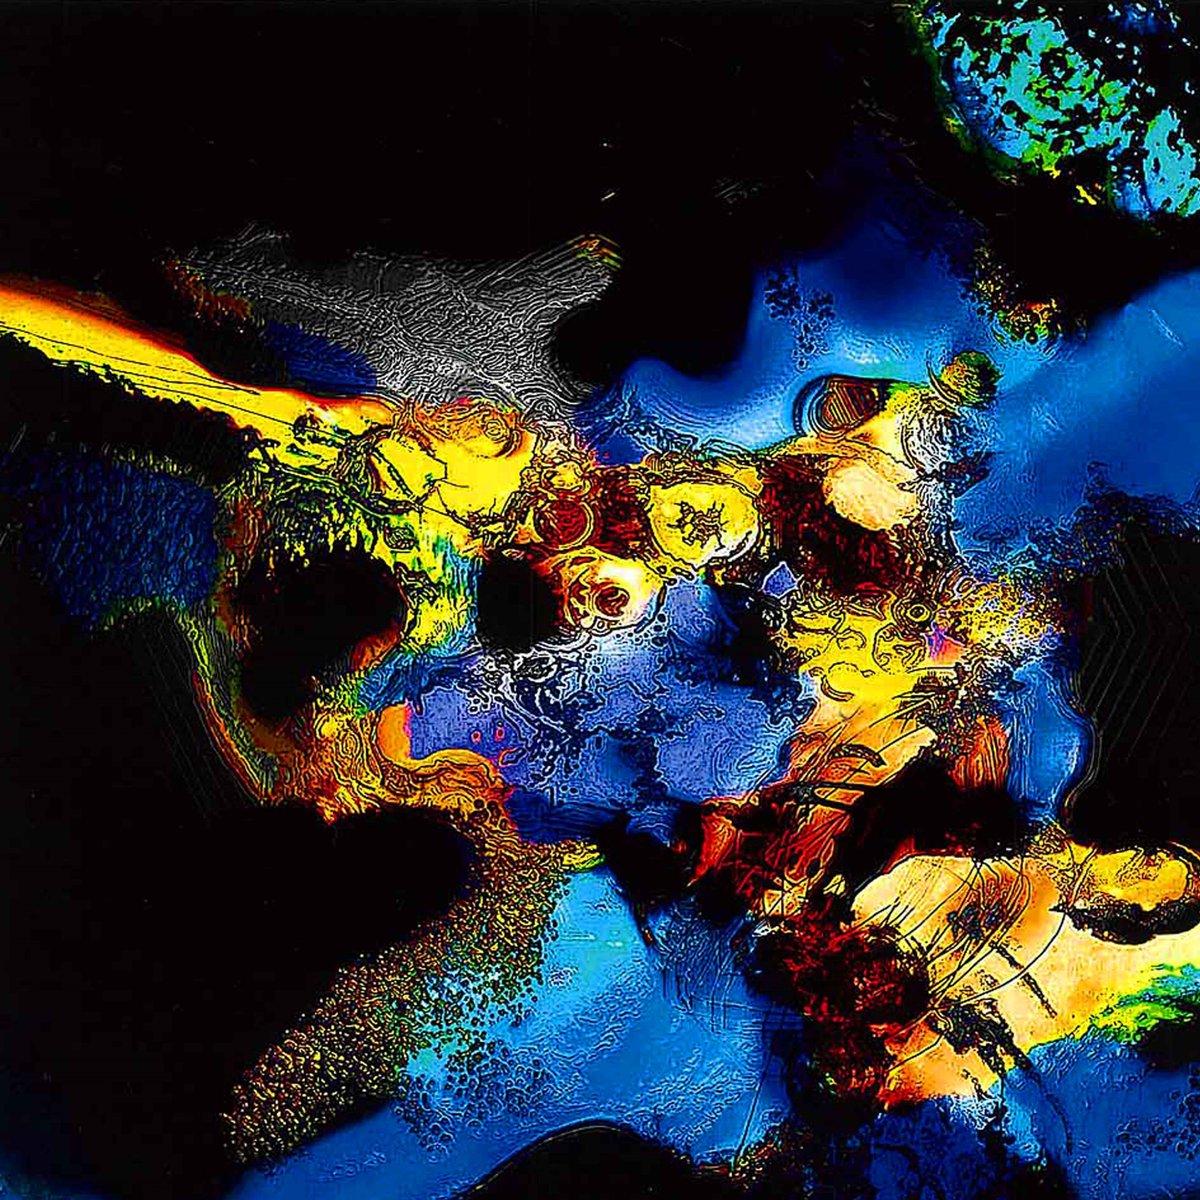 &quot; Midnight Black &quot;   Taizo Hayashi ; Art works ; japan #絵描きさんと繋がりたい #抽象画 #デジタル    #abstractpainting #arte #night #abstractart #onsale<br>http://pic.twitter.com/9MdoleGUPf